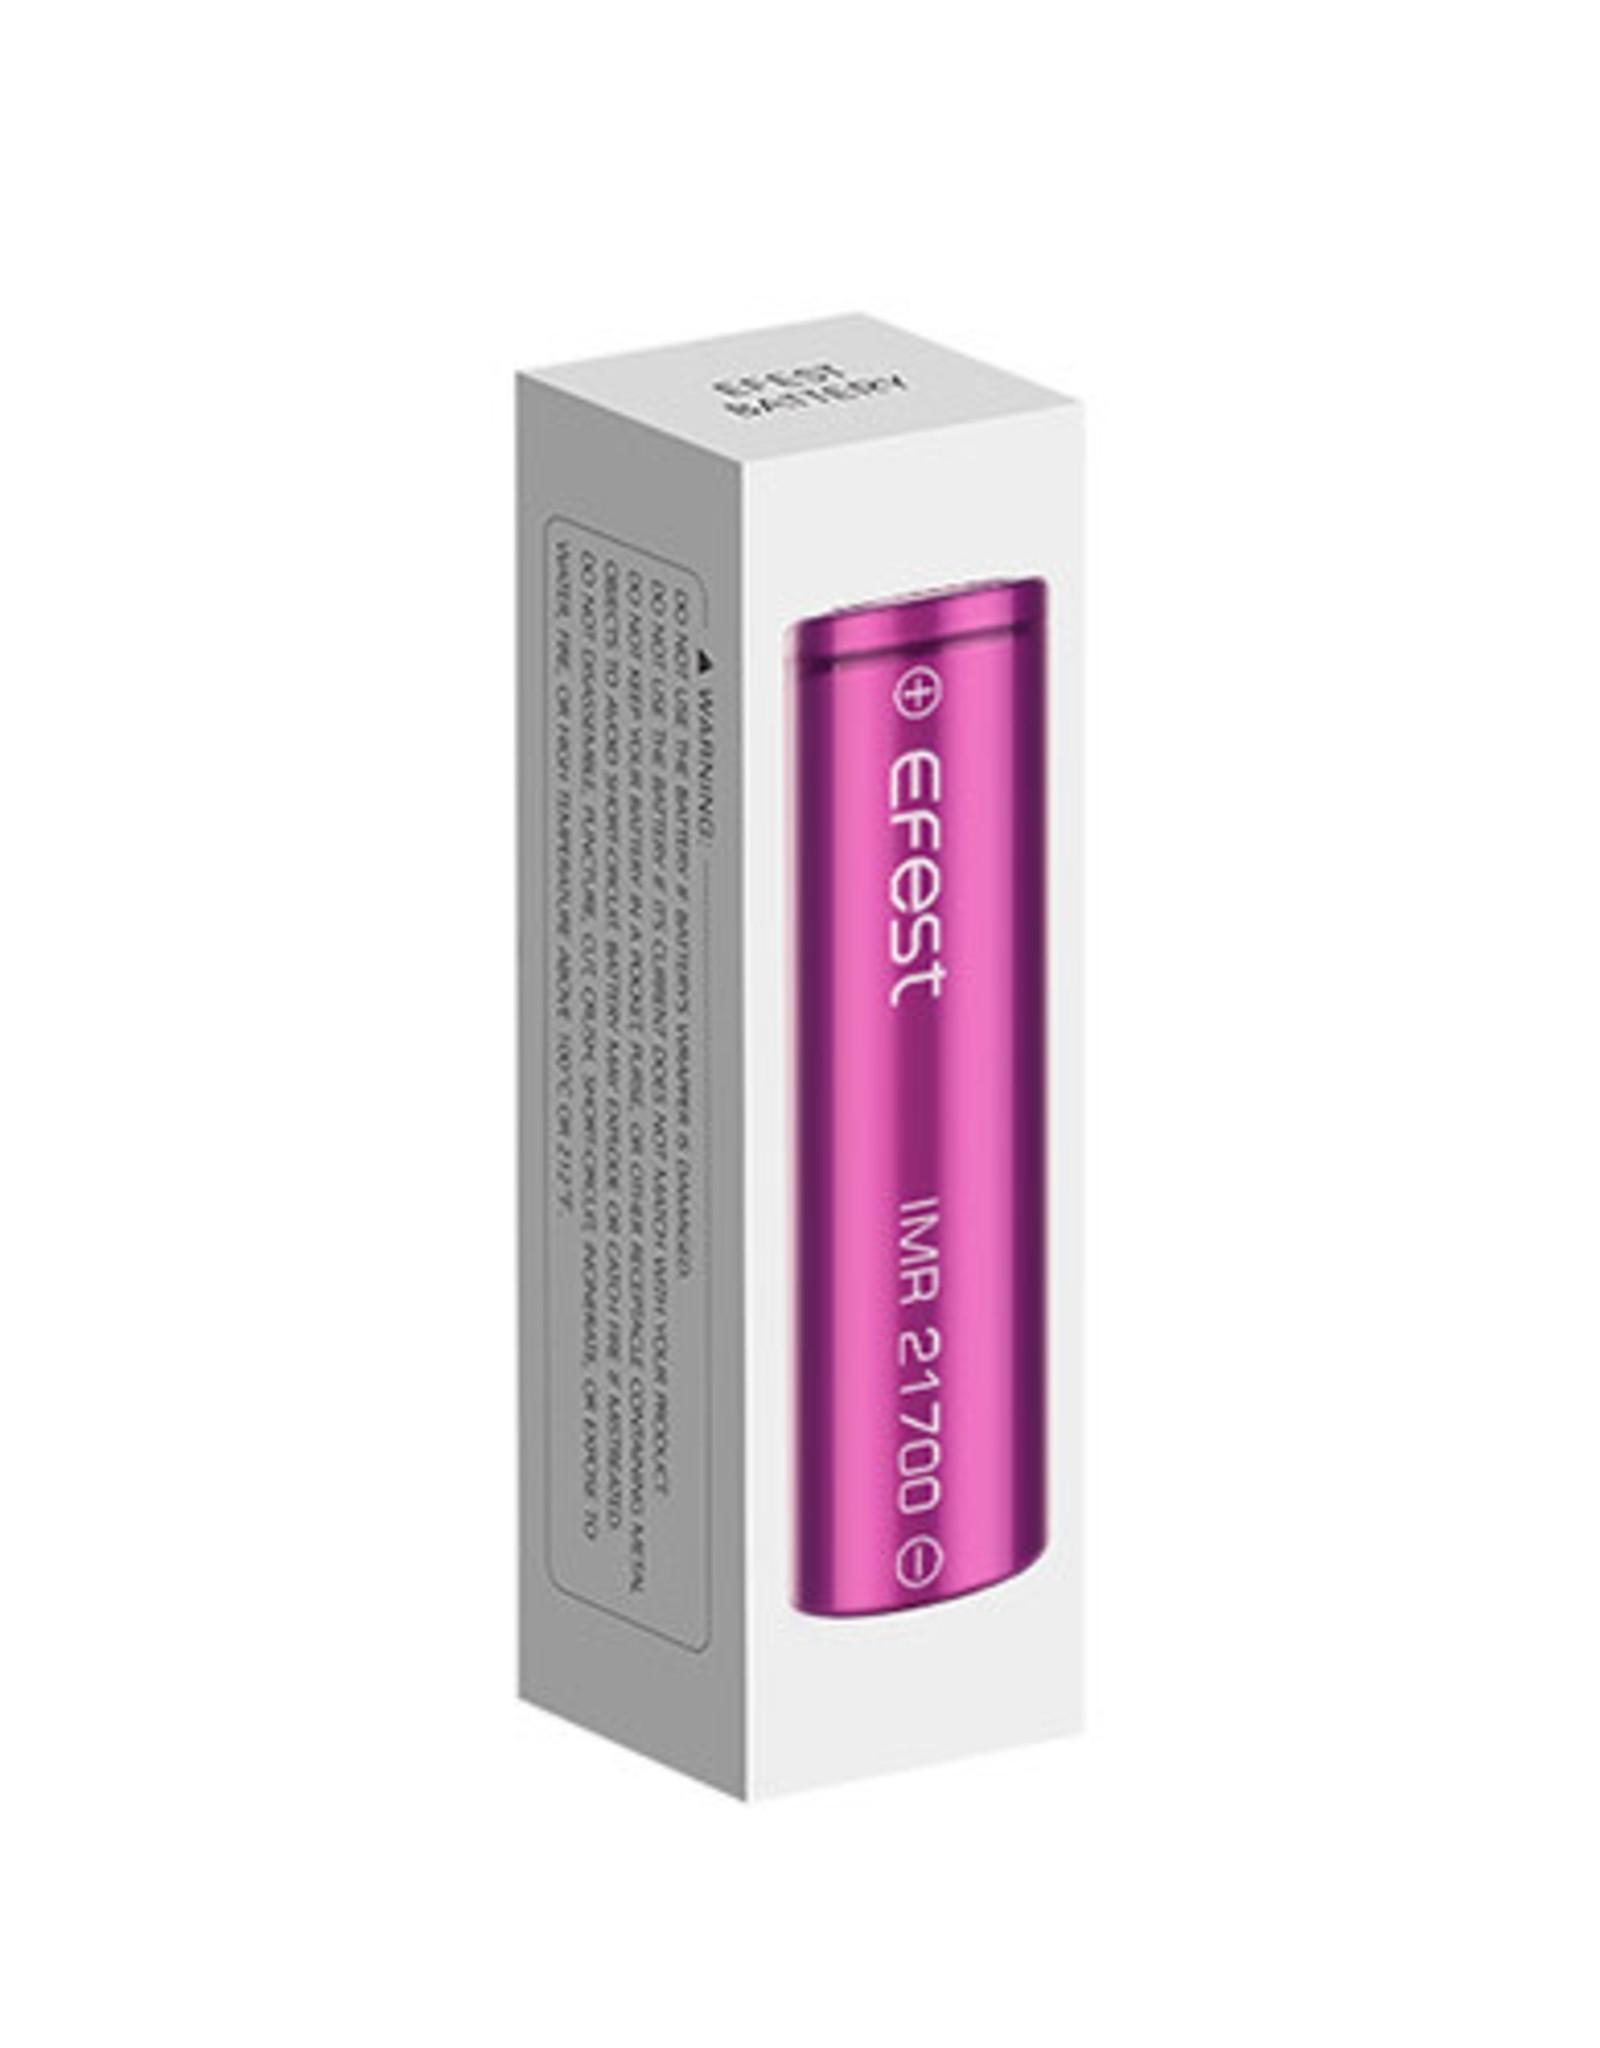 Efest 21700 3700mAh Battery